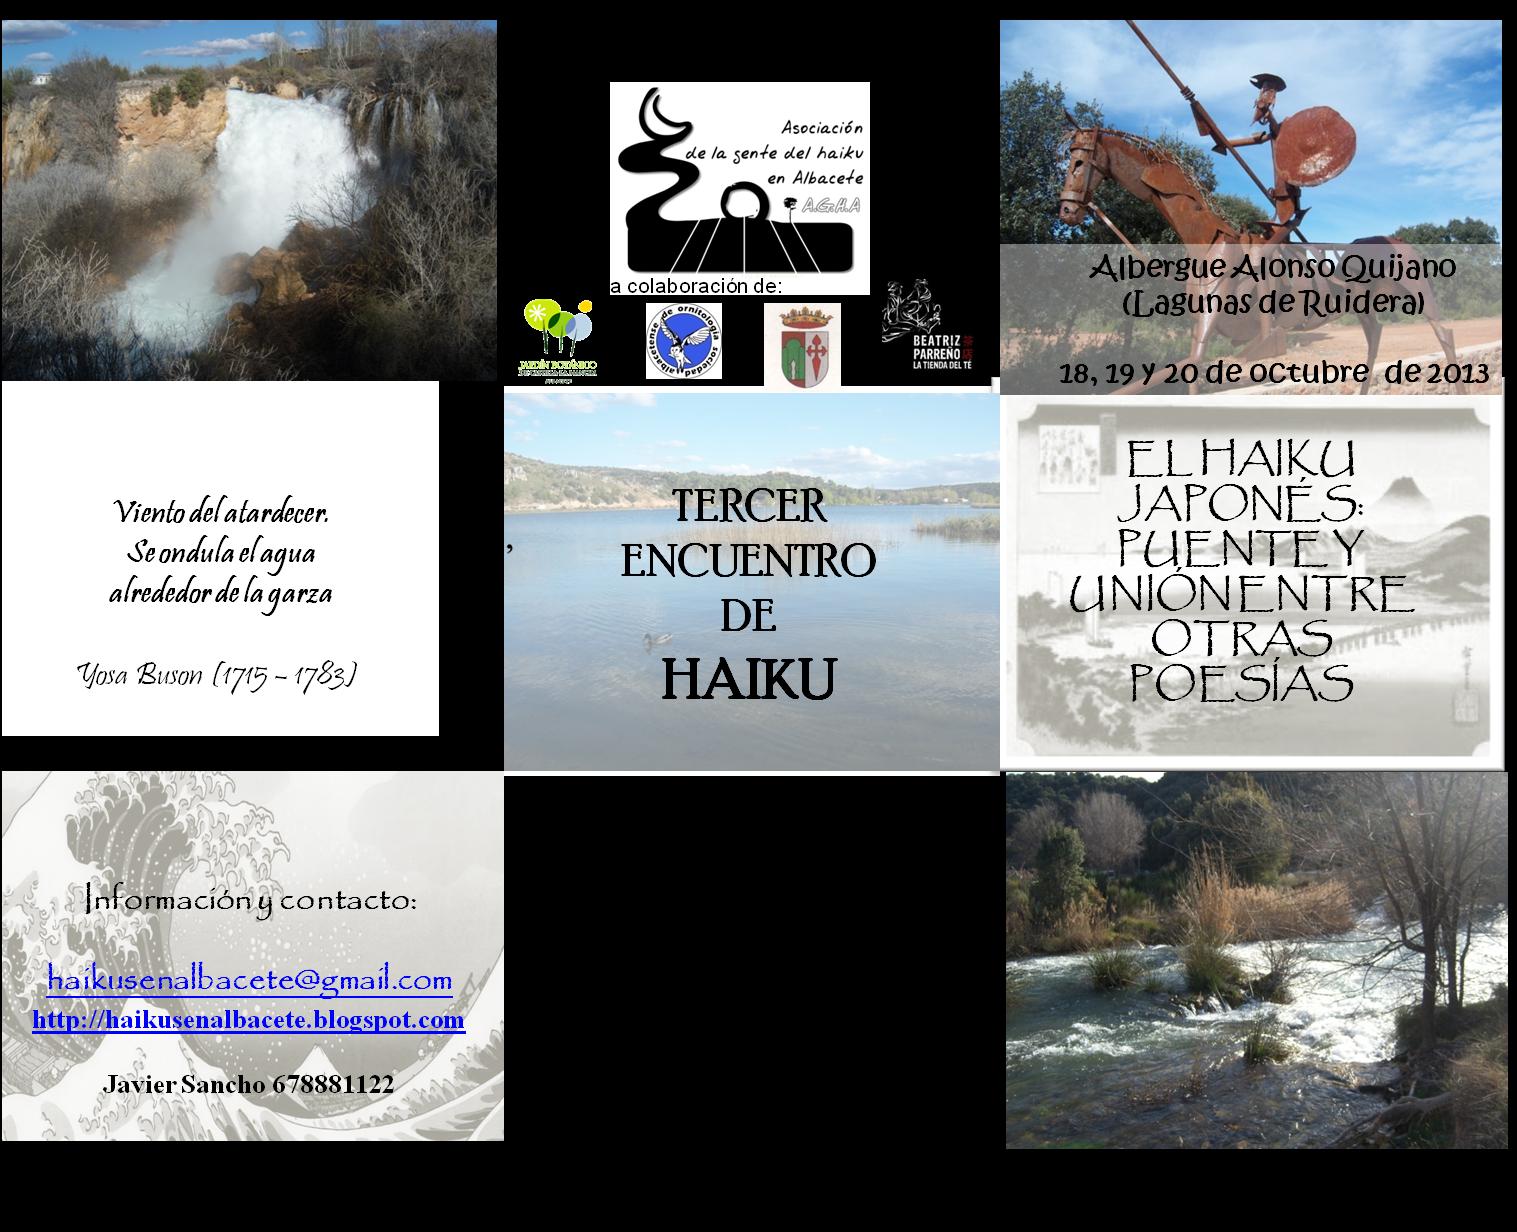 Tercer Encuentro de Haiku - Lagunas de Ruidera (Albacete) 2013